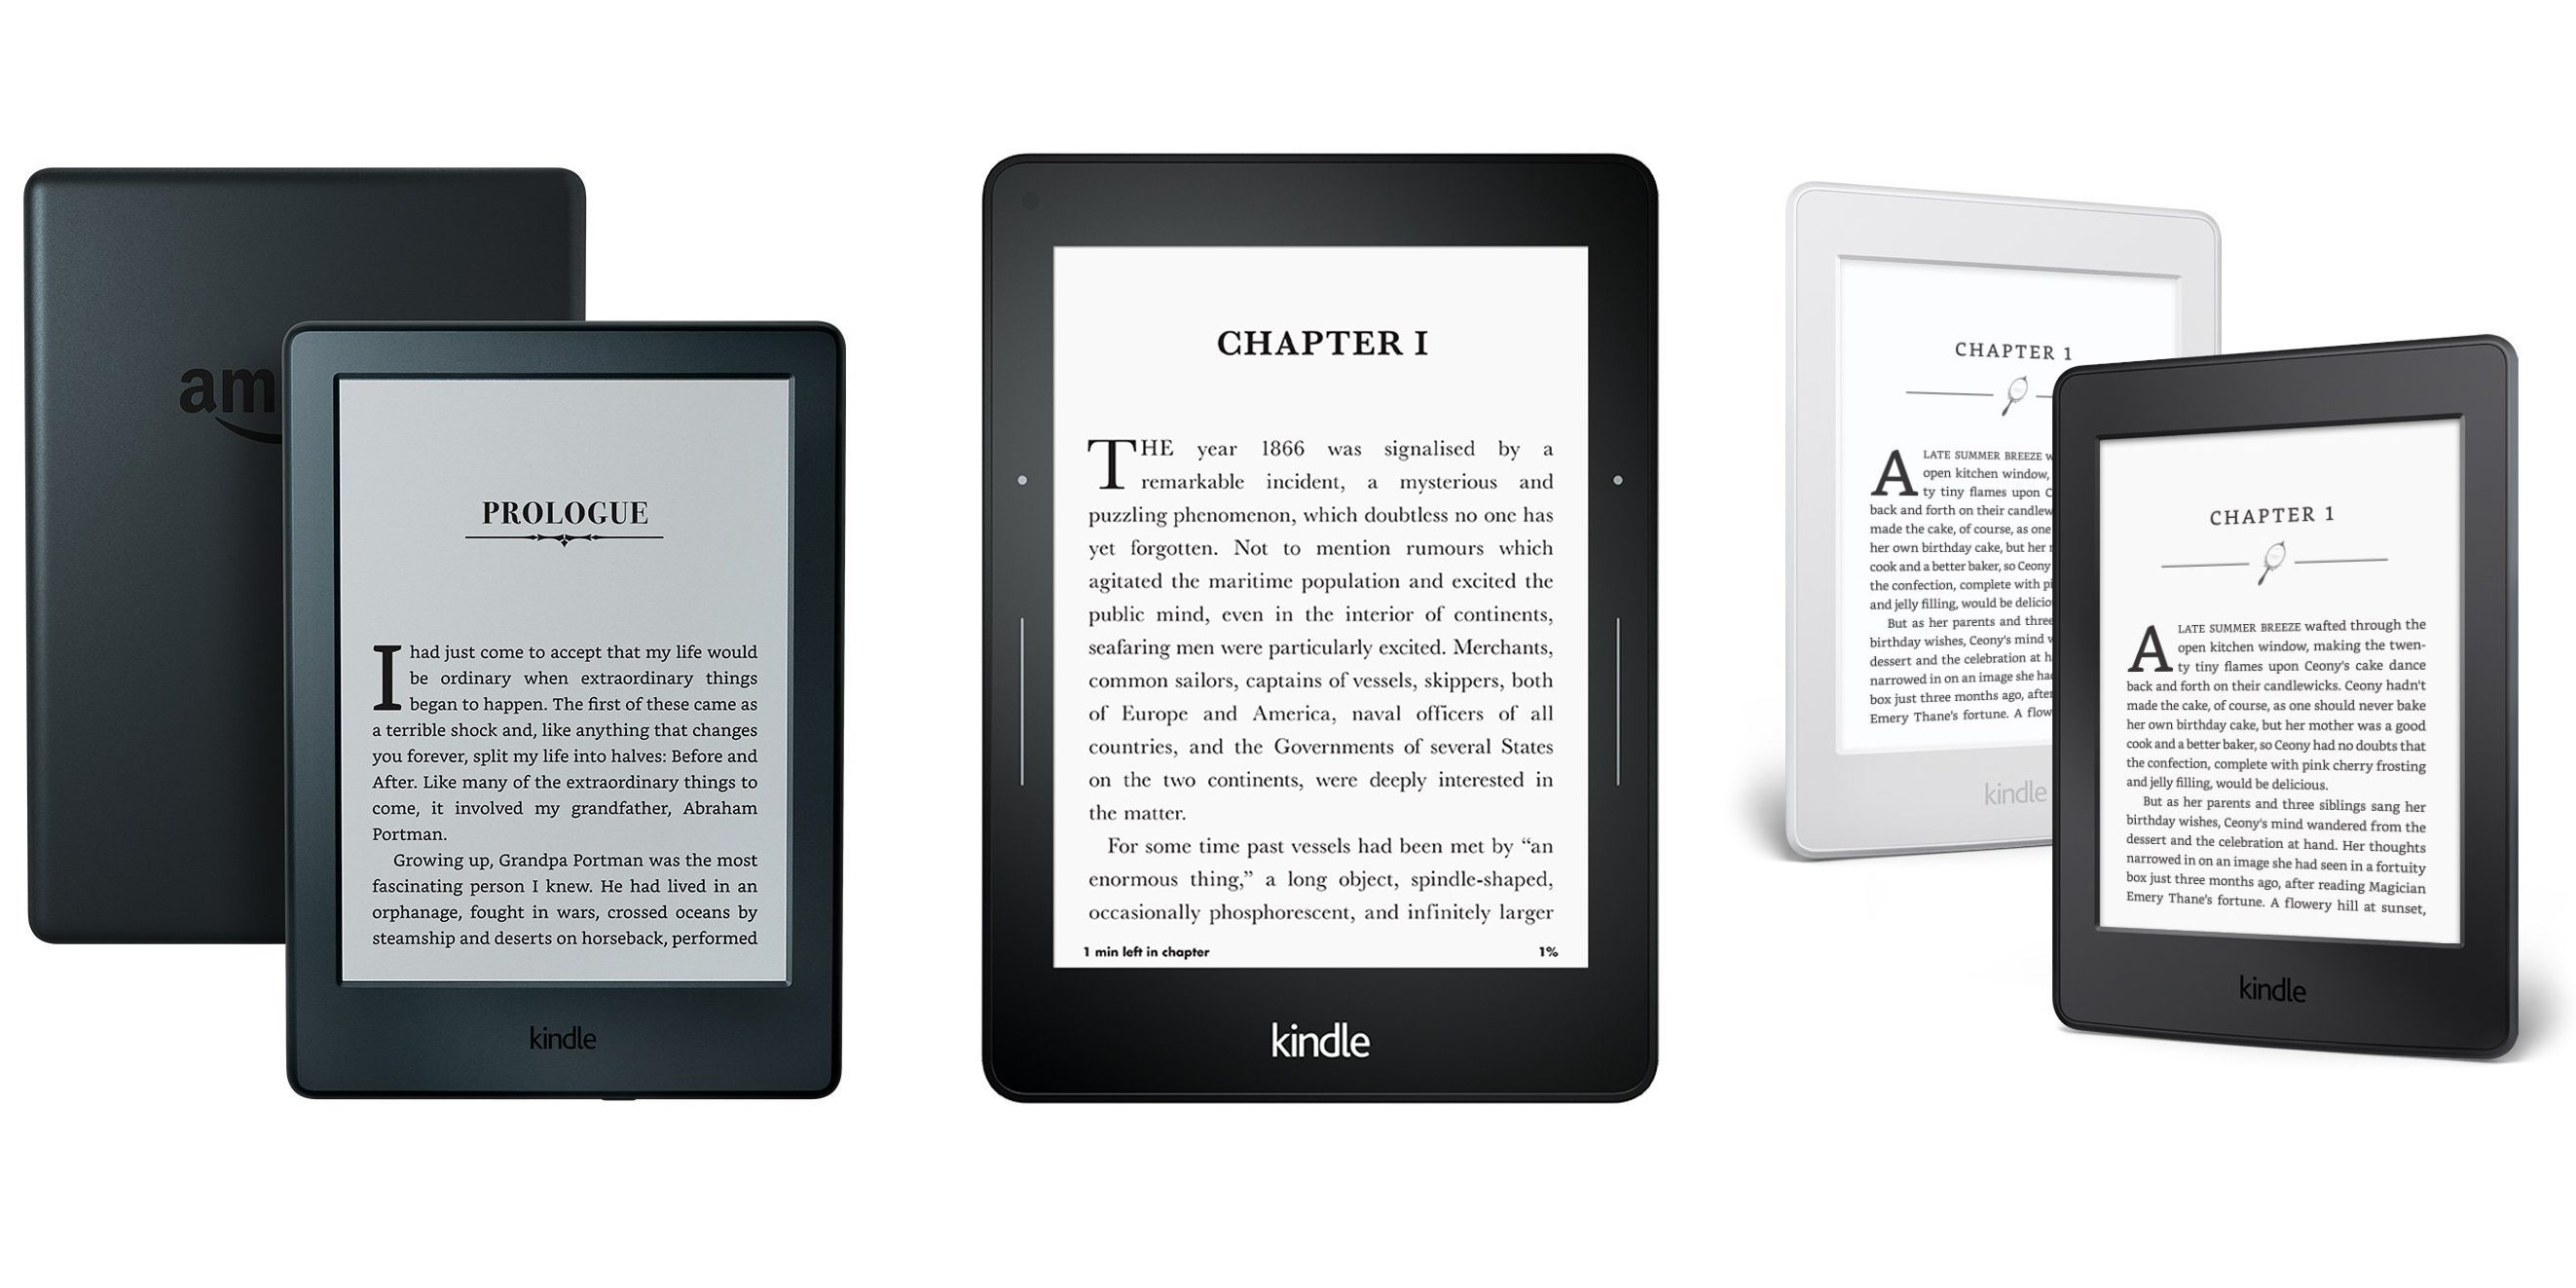 kindle-e-reader-discounts-1